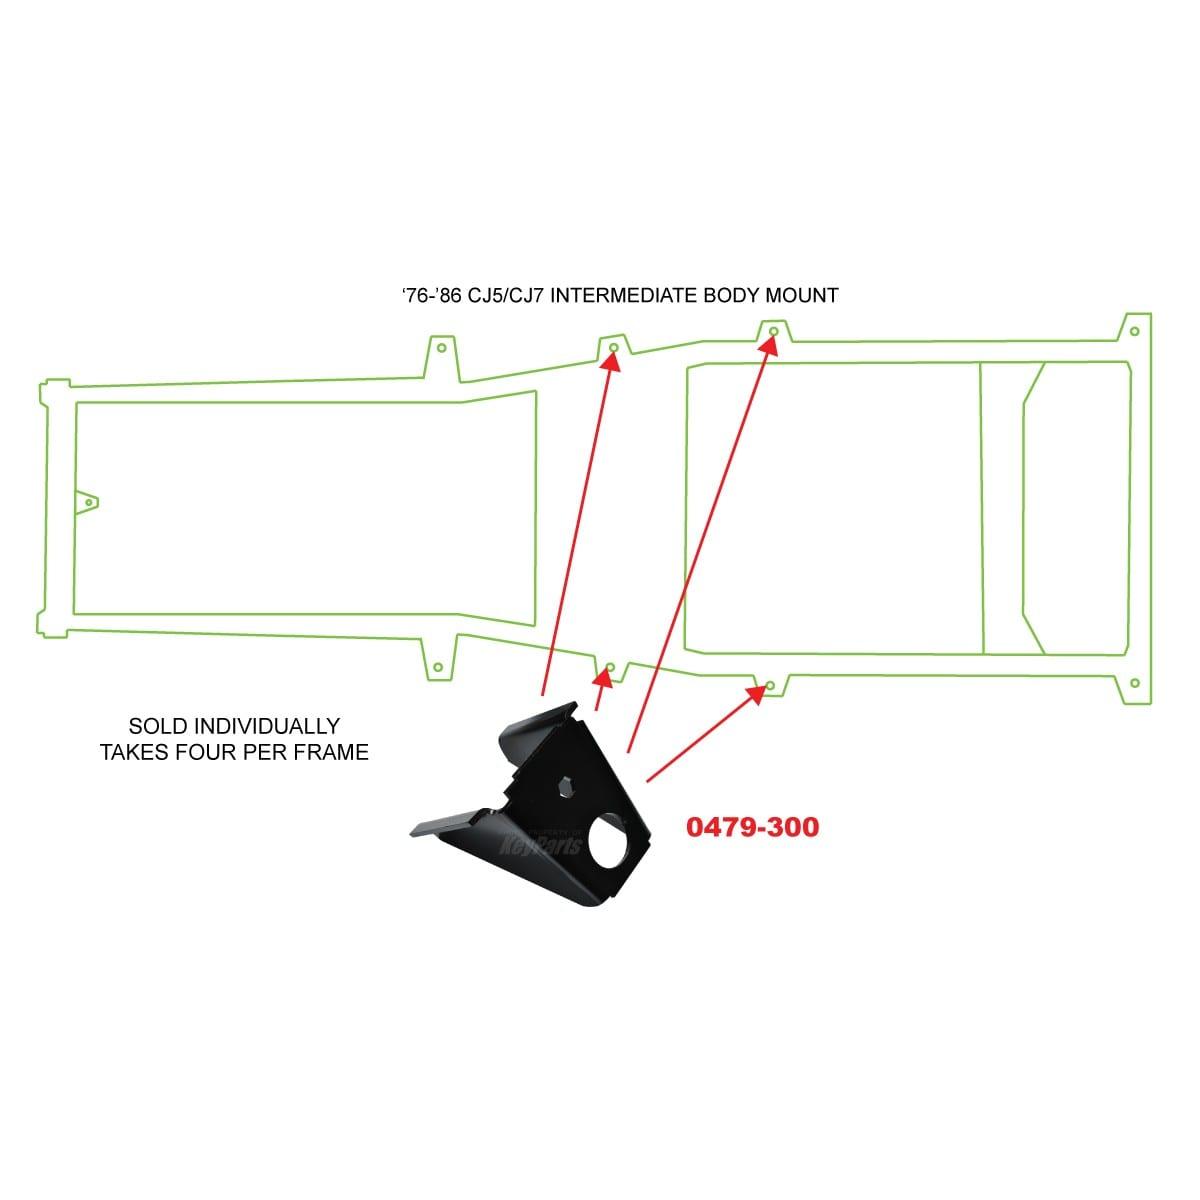 Diagram Jeep Cj7 Body Mount Diagram Full Version Hd Quality Mount Diagram N1d2love Edilgress It